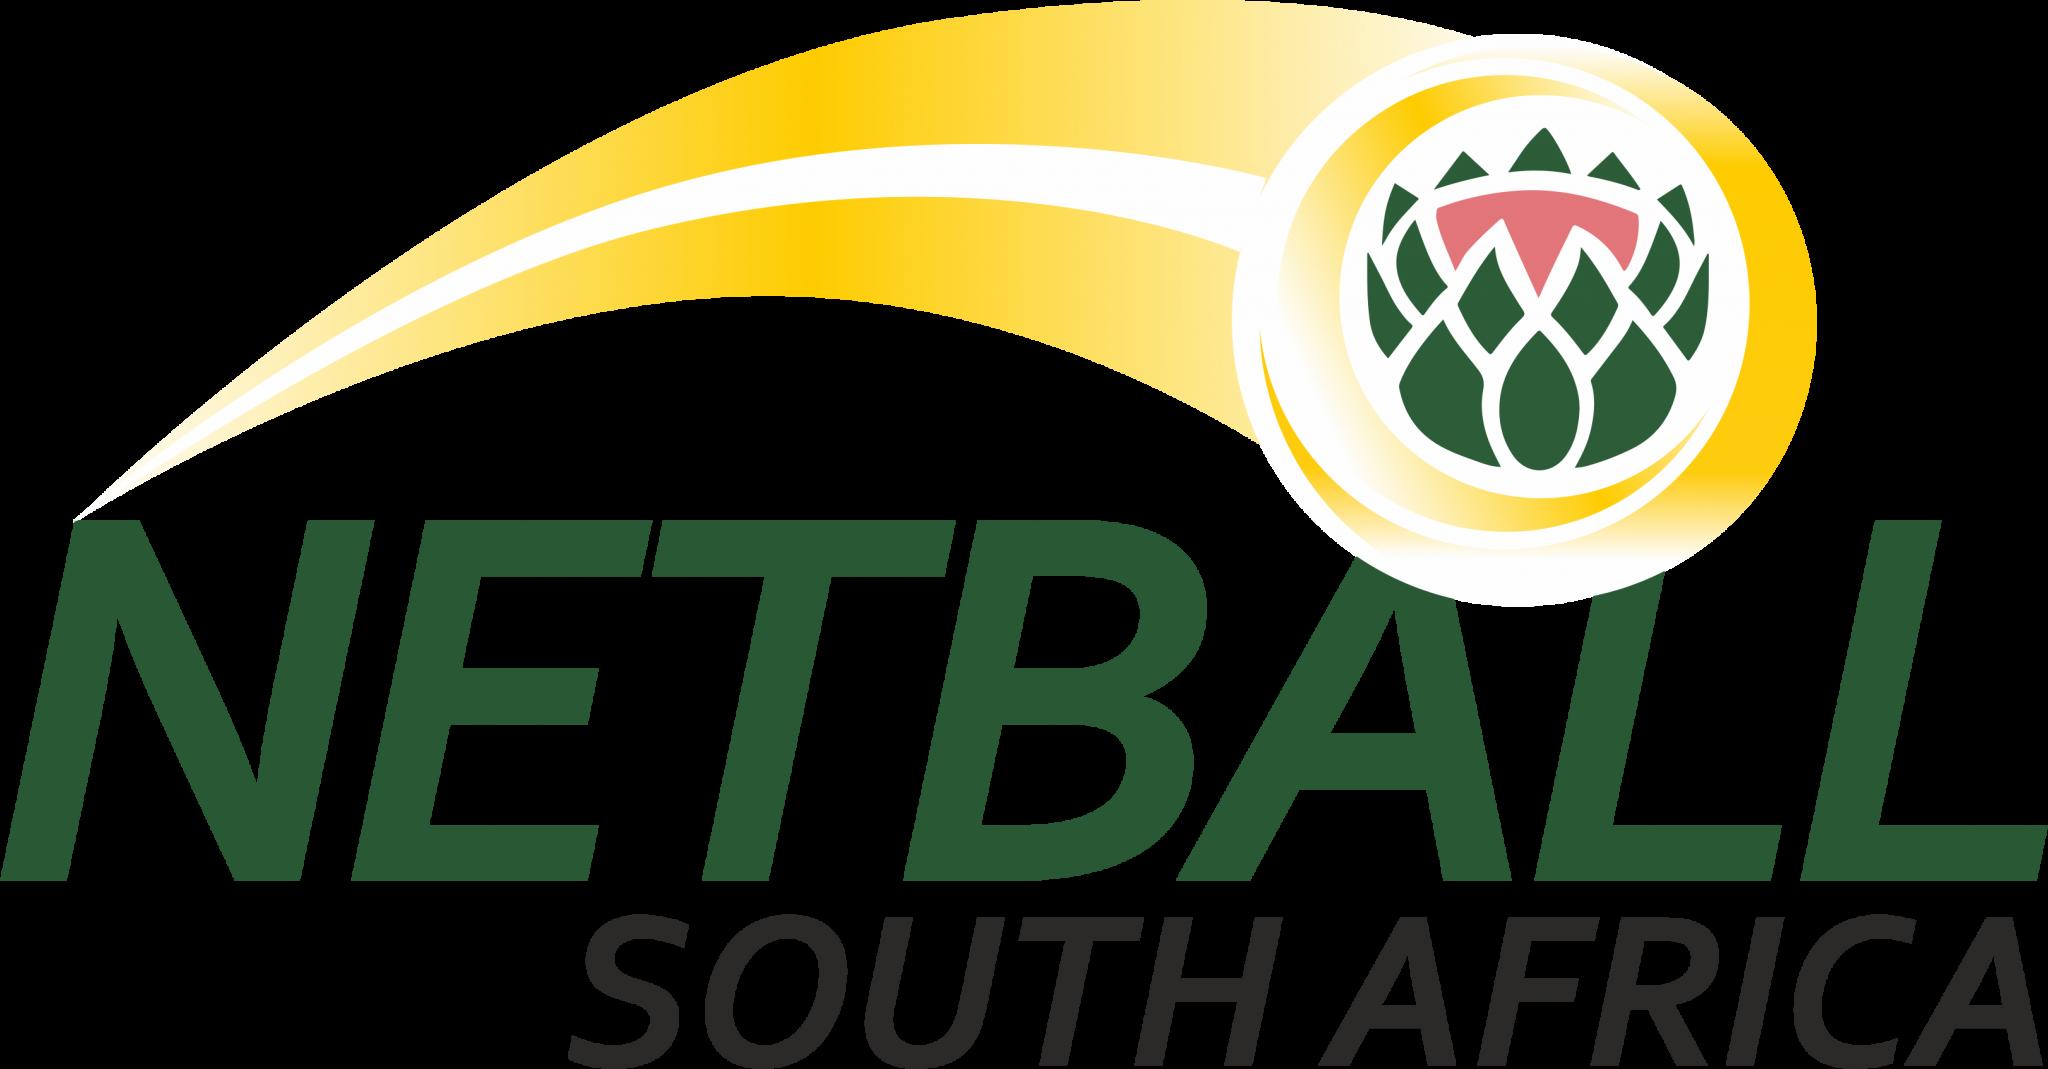 Netball South Africa : Brand Short Description Type Here.